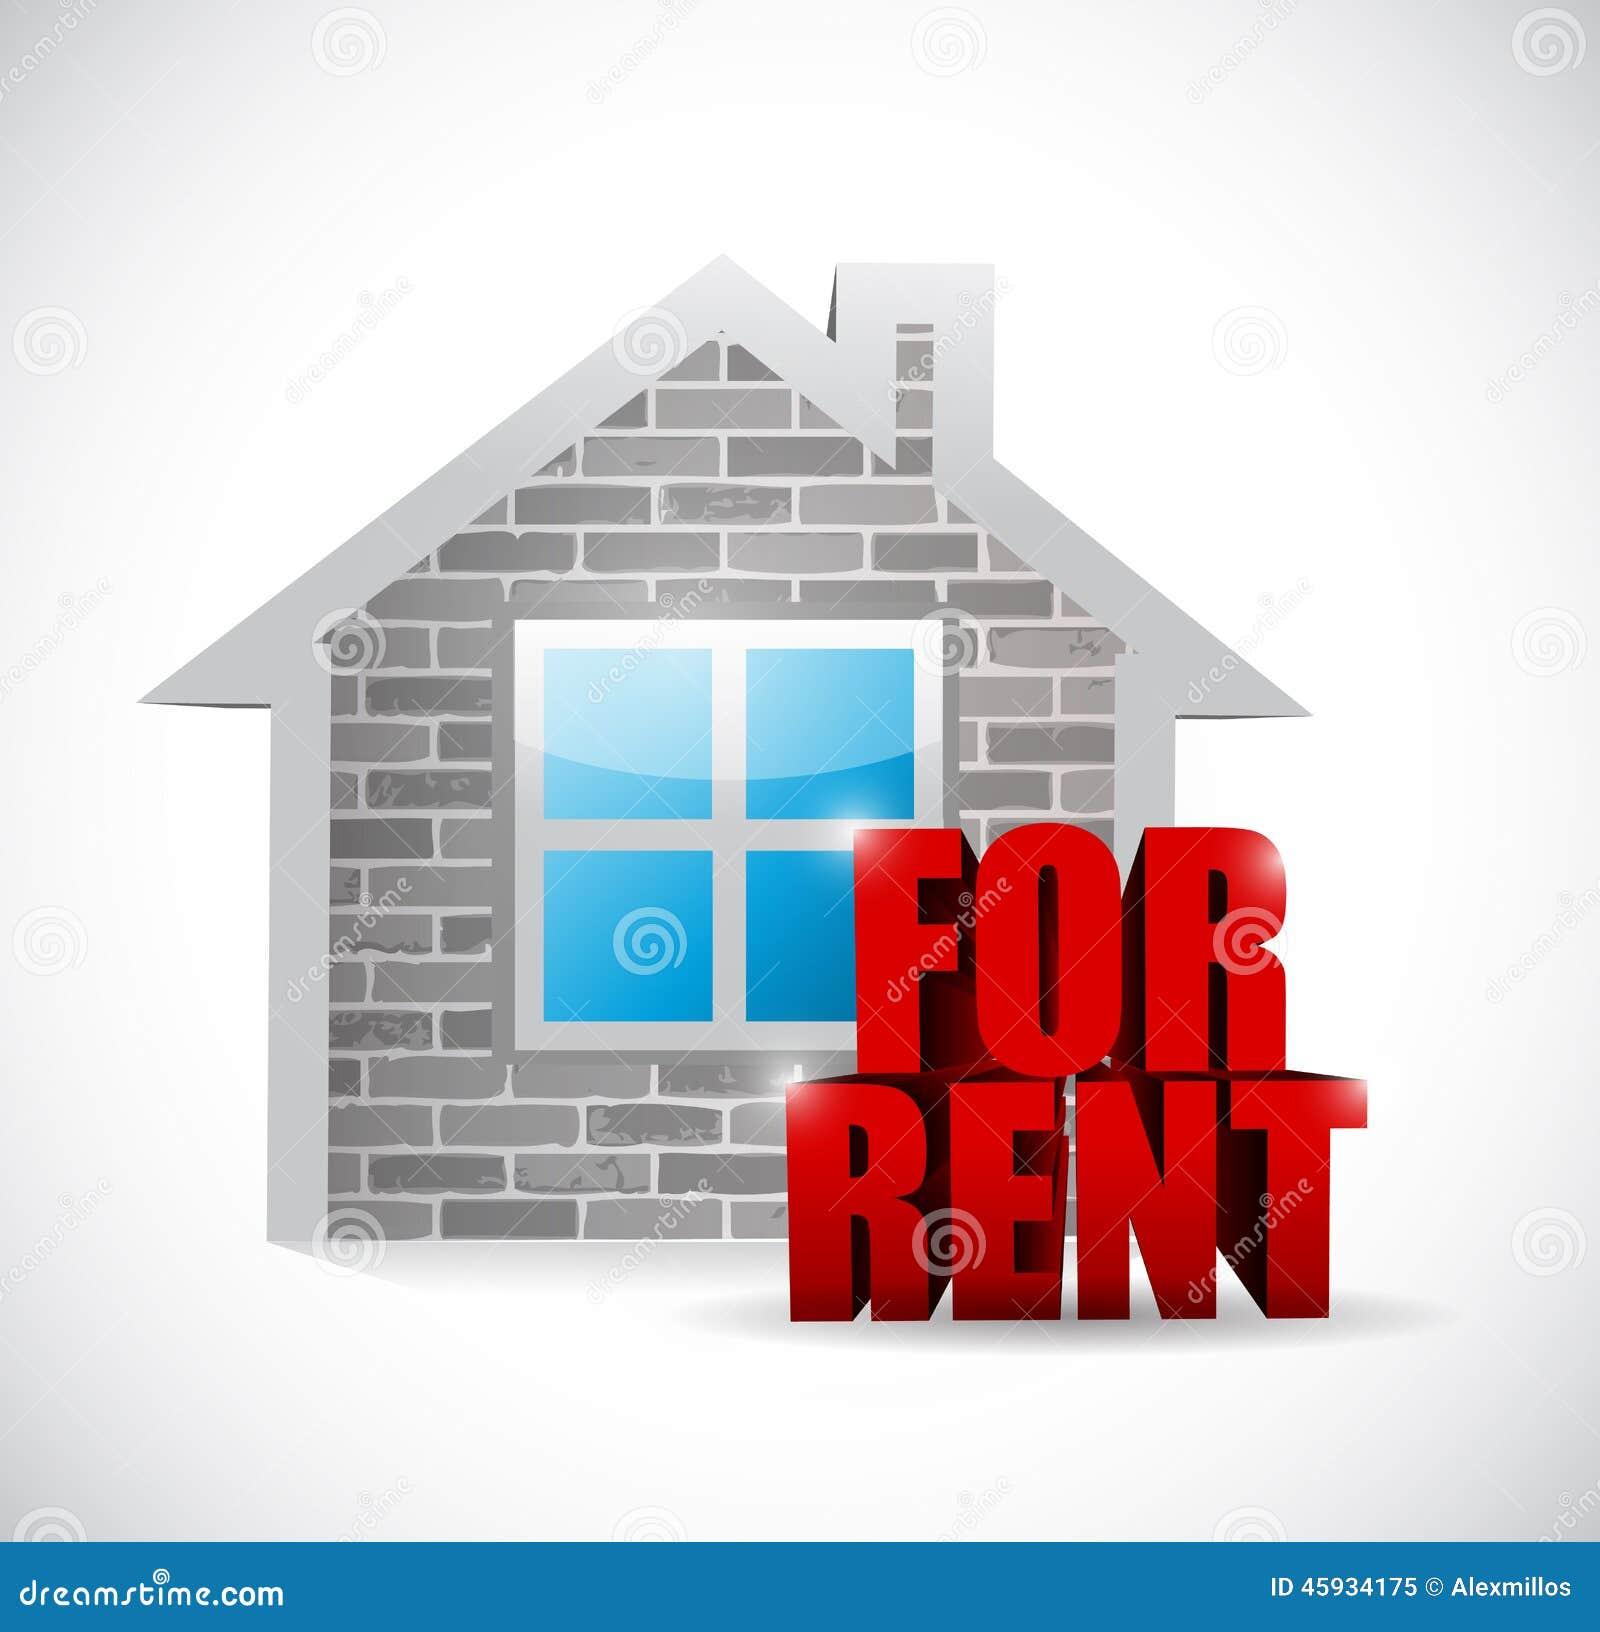 Home for rent illustration design stock illustration for Home for rent design